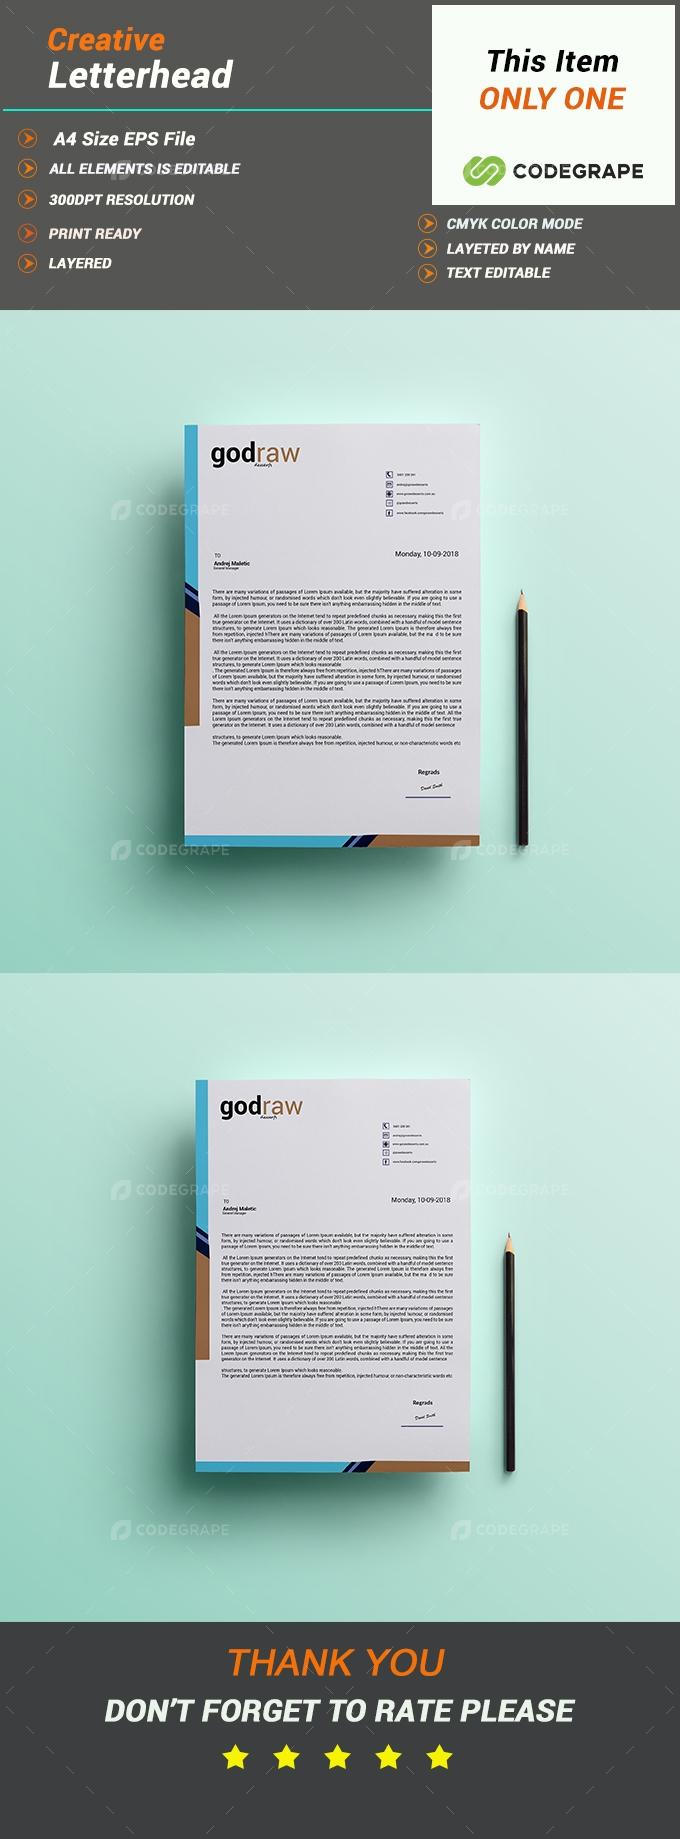 Creative Letterhead Design